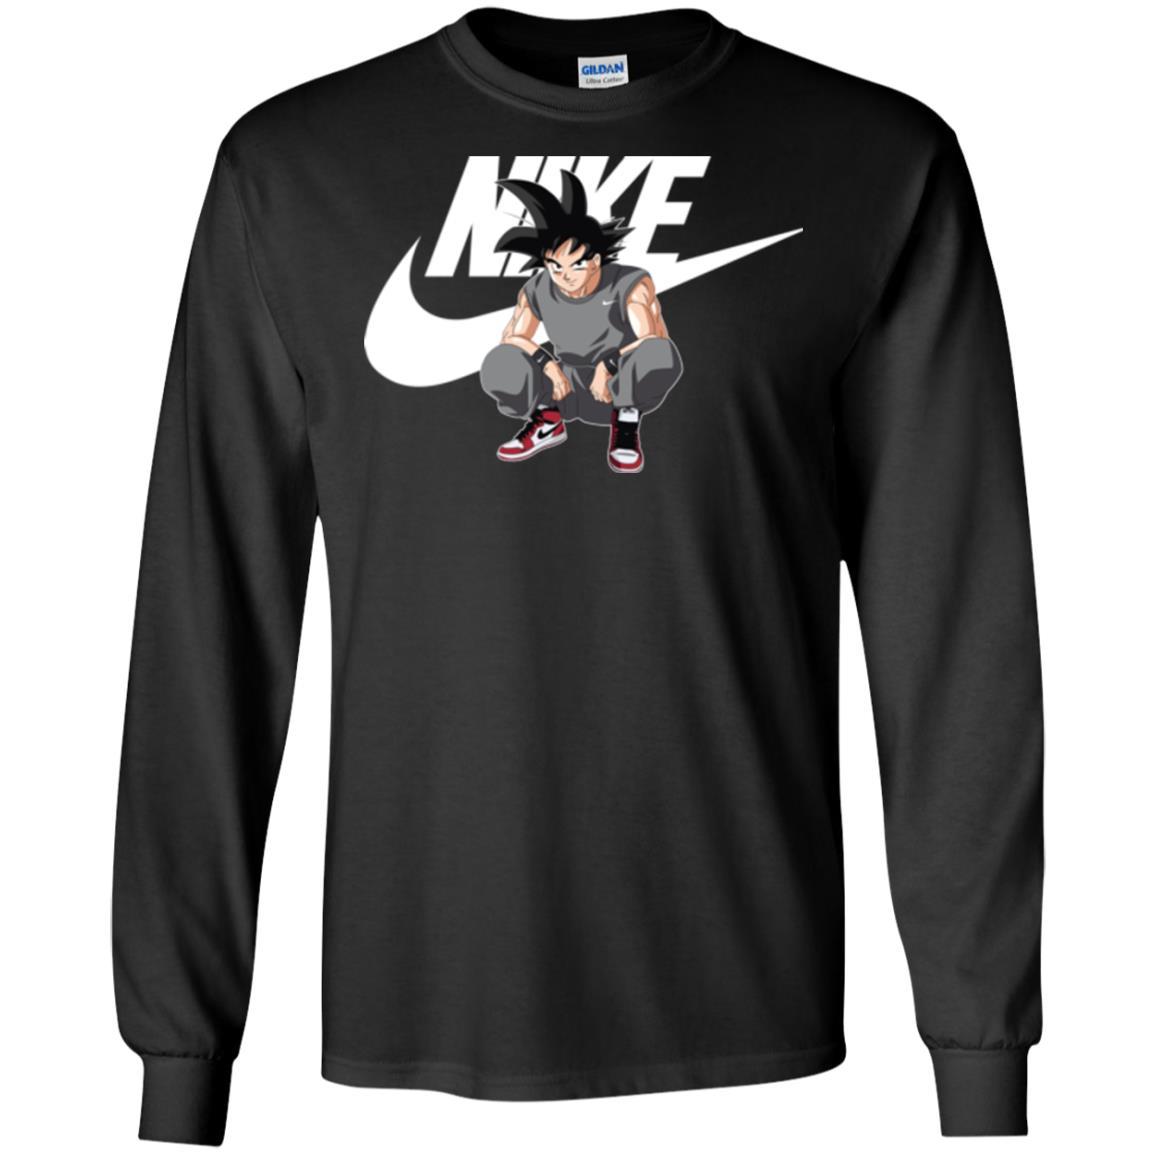 image 252px Songoku Nike Mashup T Shirt, Hoodies, Tank Top